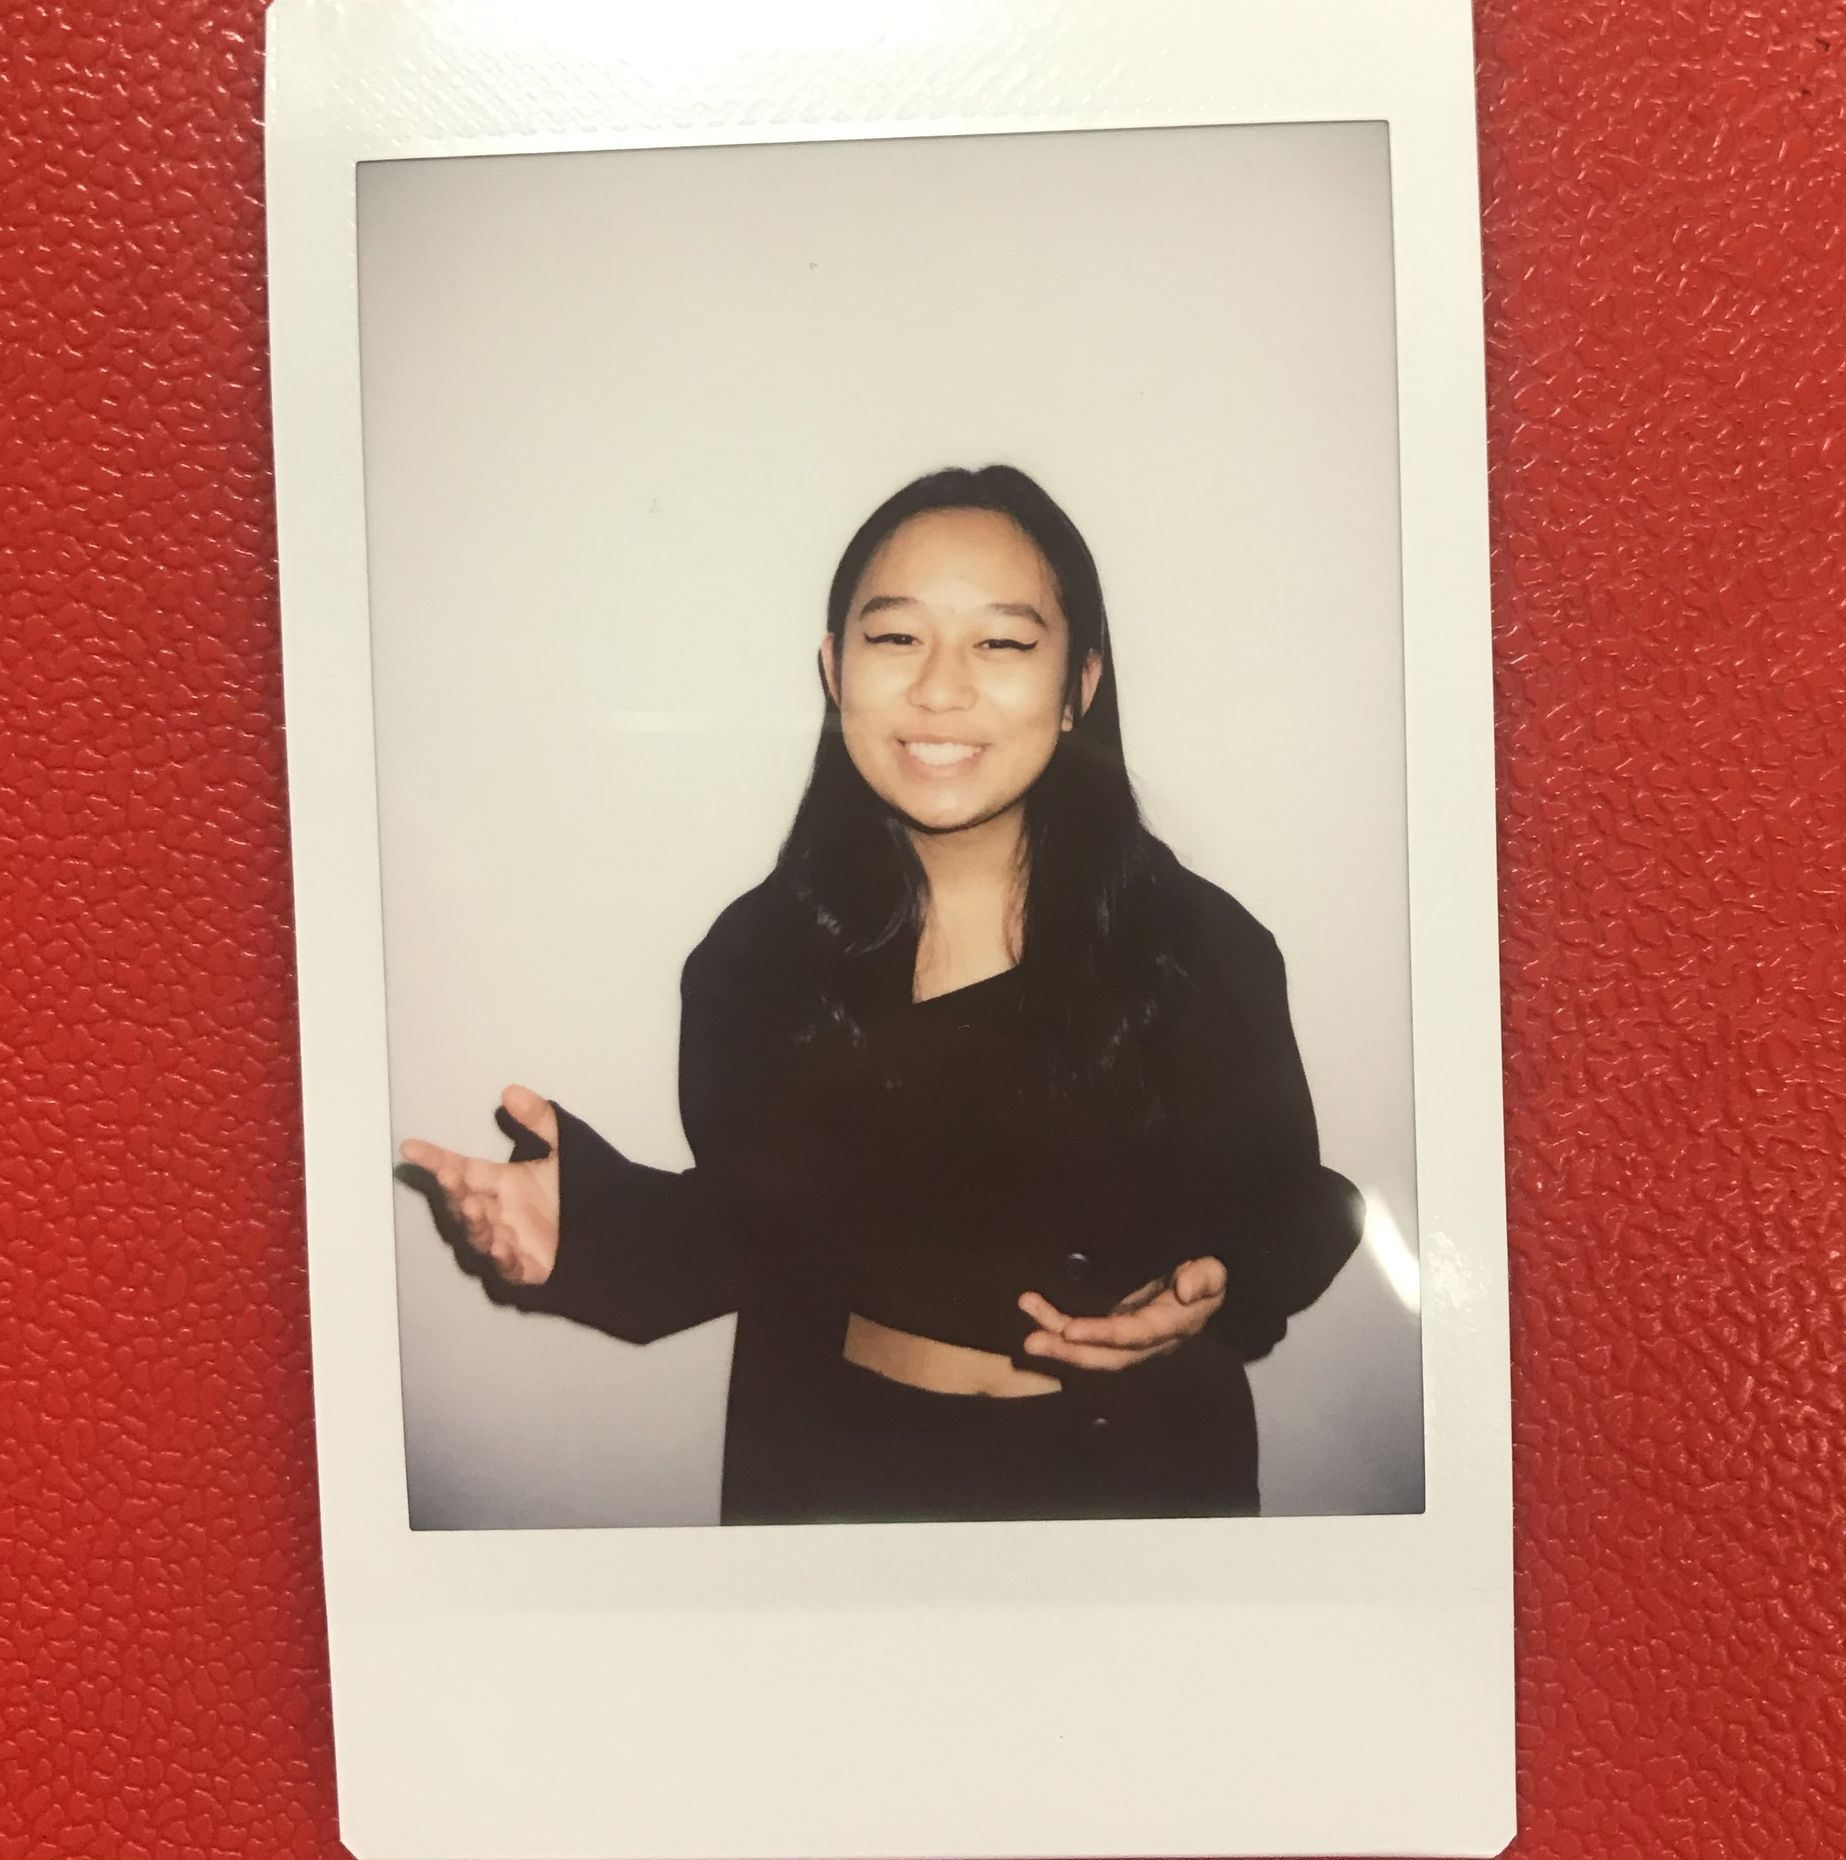 A Polaroid photo of Vi smiling at the camera.